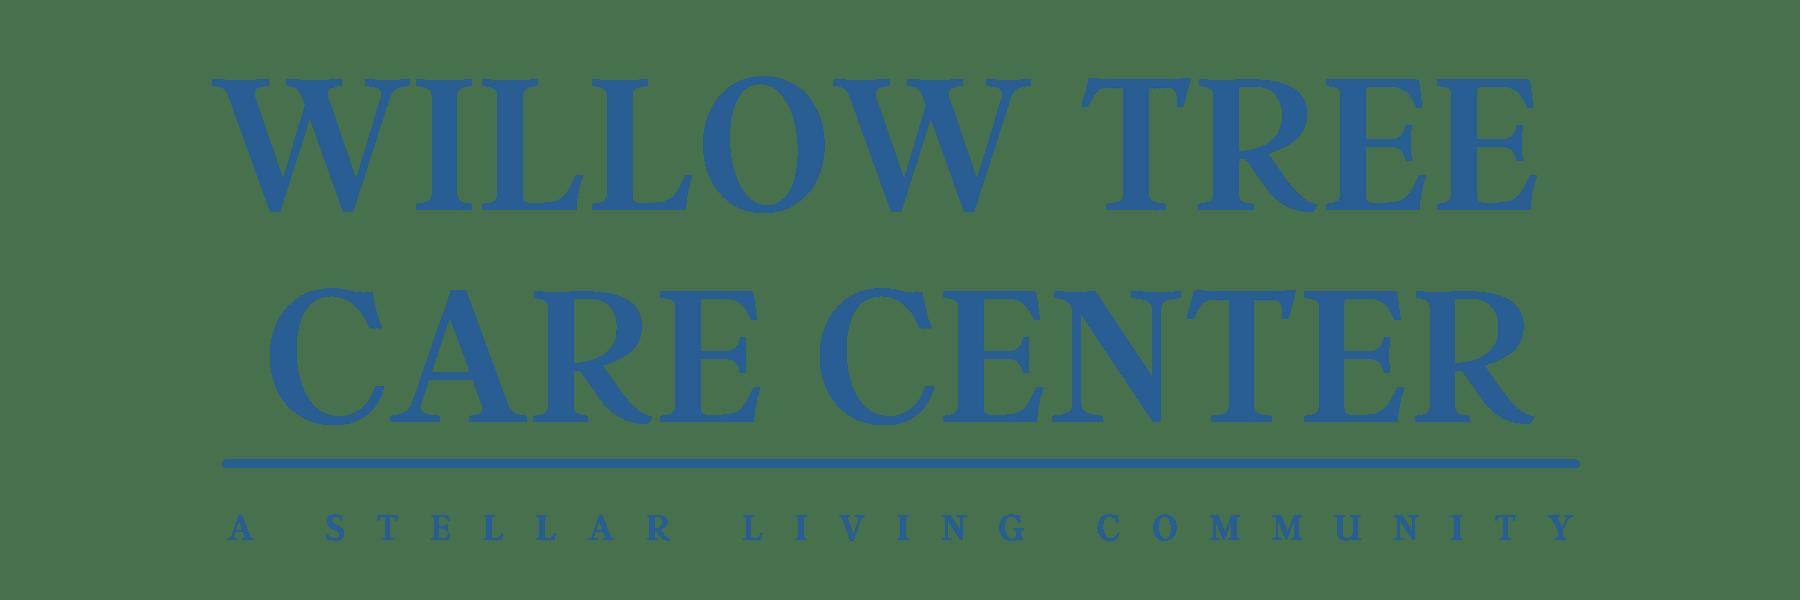 Willow Tree Care Center Skilled Nursing Delta Colorado Logo